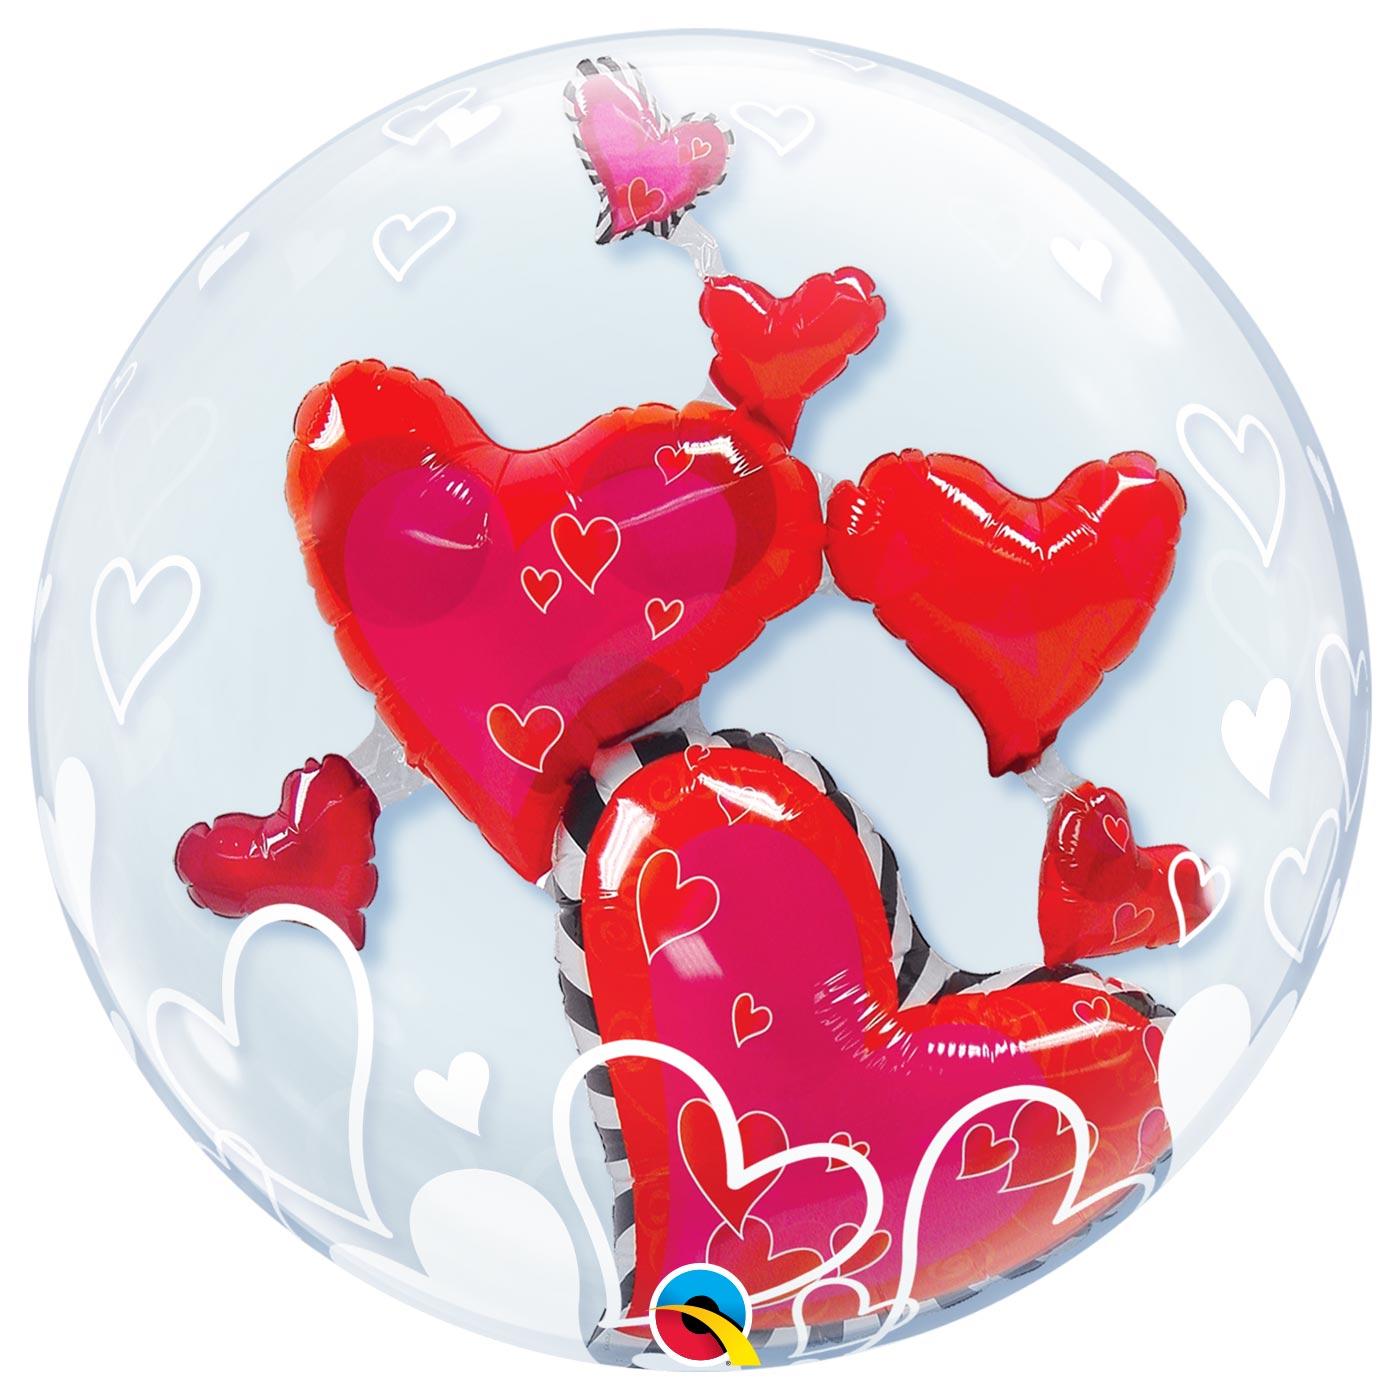 Double Bubble Lovely Hearts